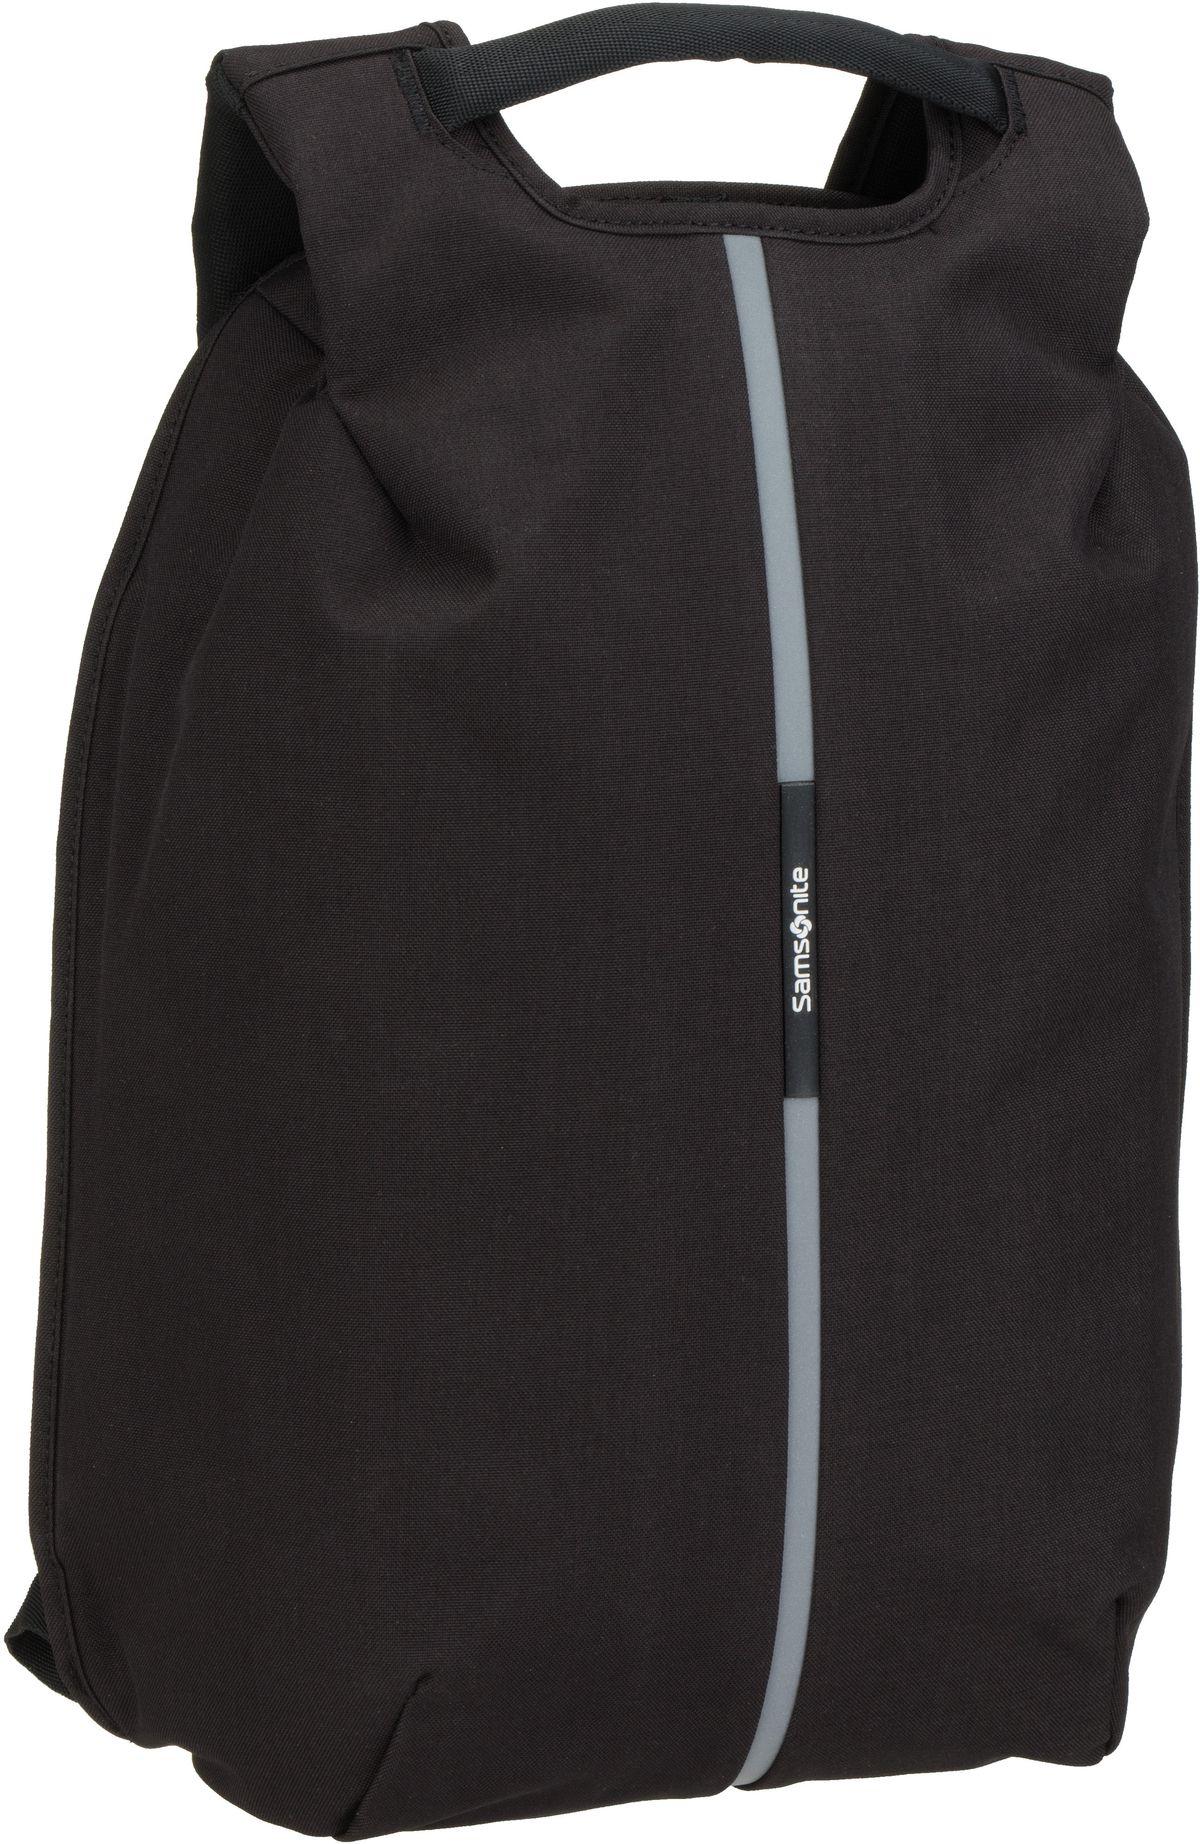 Rucksack / Daypack Securipak Laptop Backpack 15.6'' Black Steel (17 Liter)